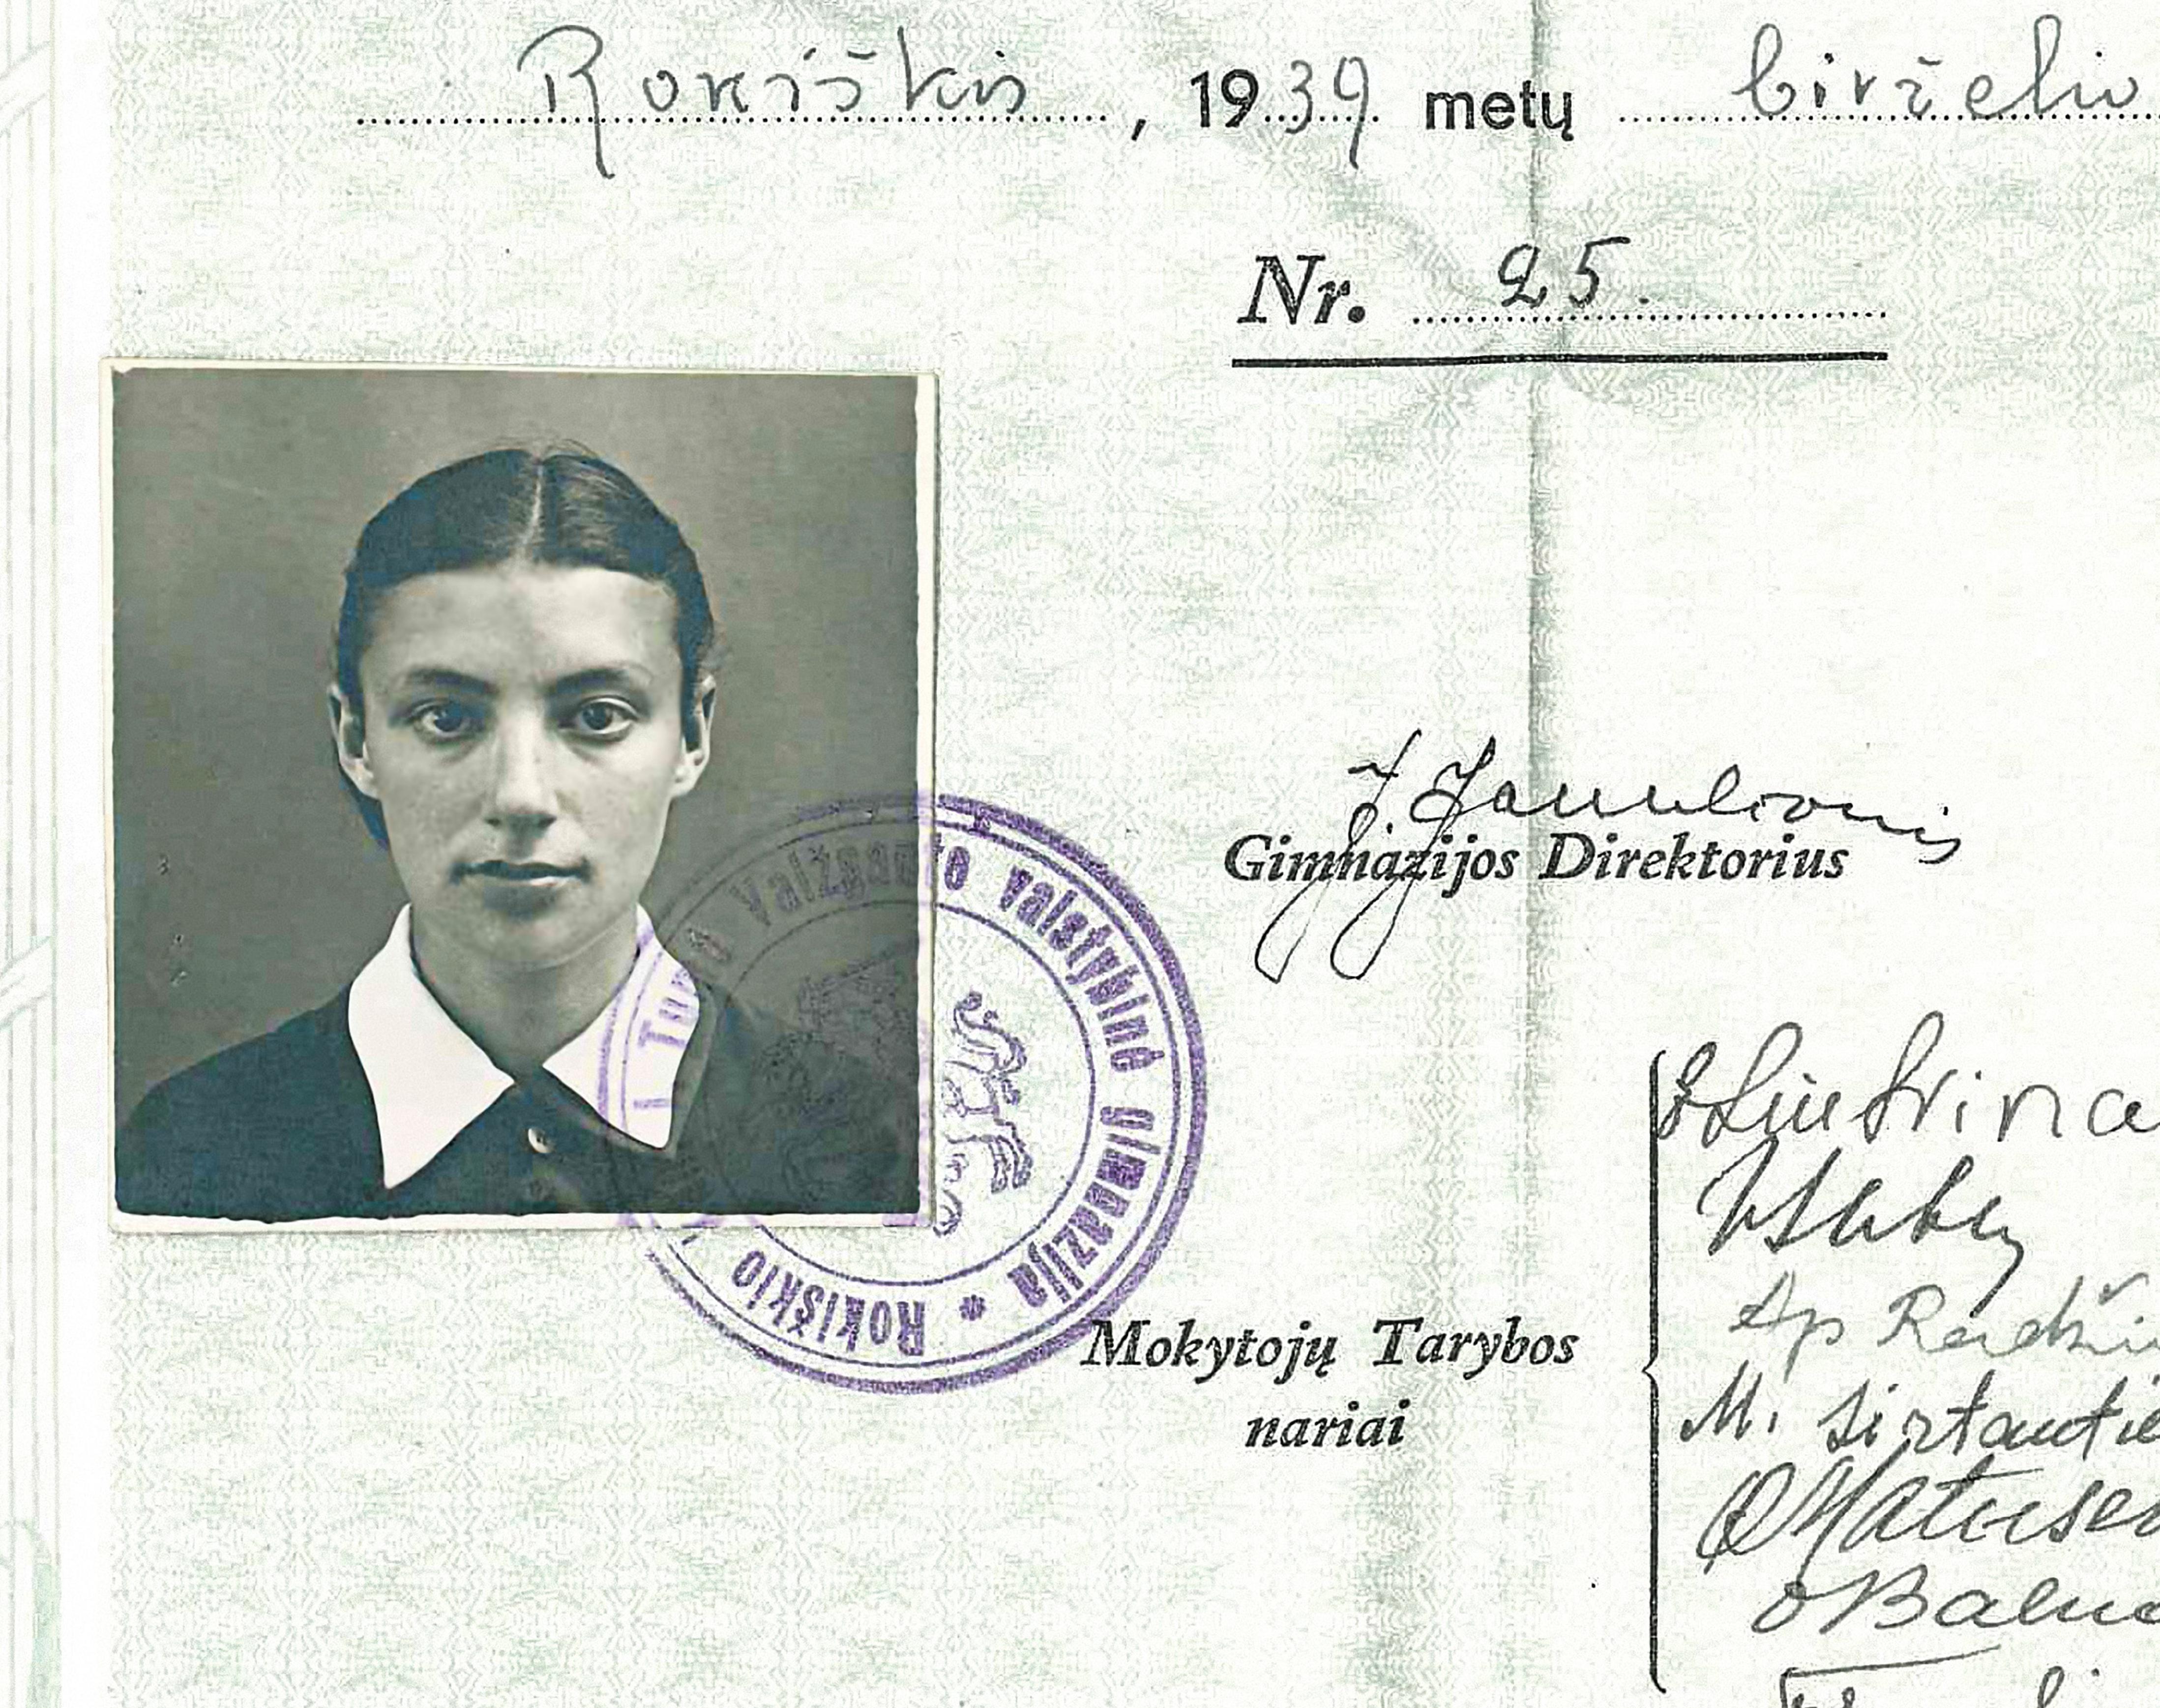 Matilda Olkin school portrait